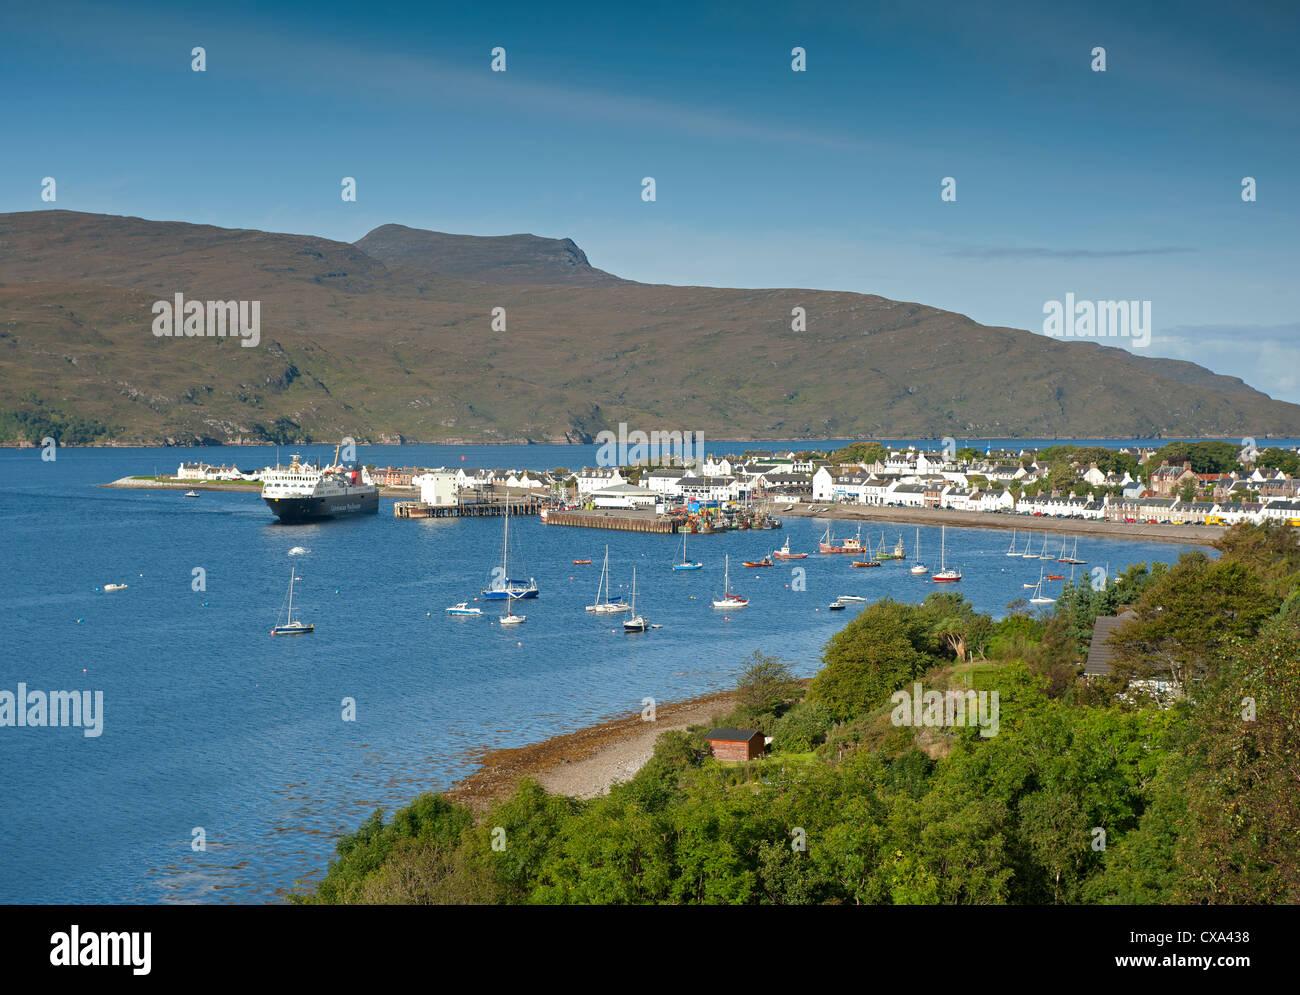 Ullapool, fishing and tourist ferry port on Loch Broom, Wester Ross Highland Region Scotland.  SCO 8531 - Stock Image